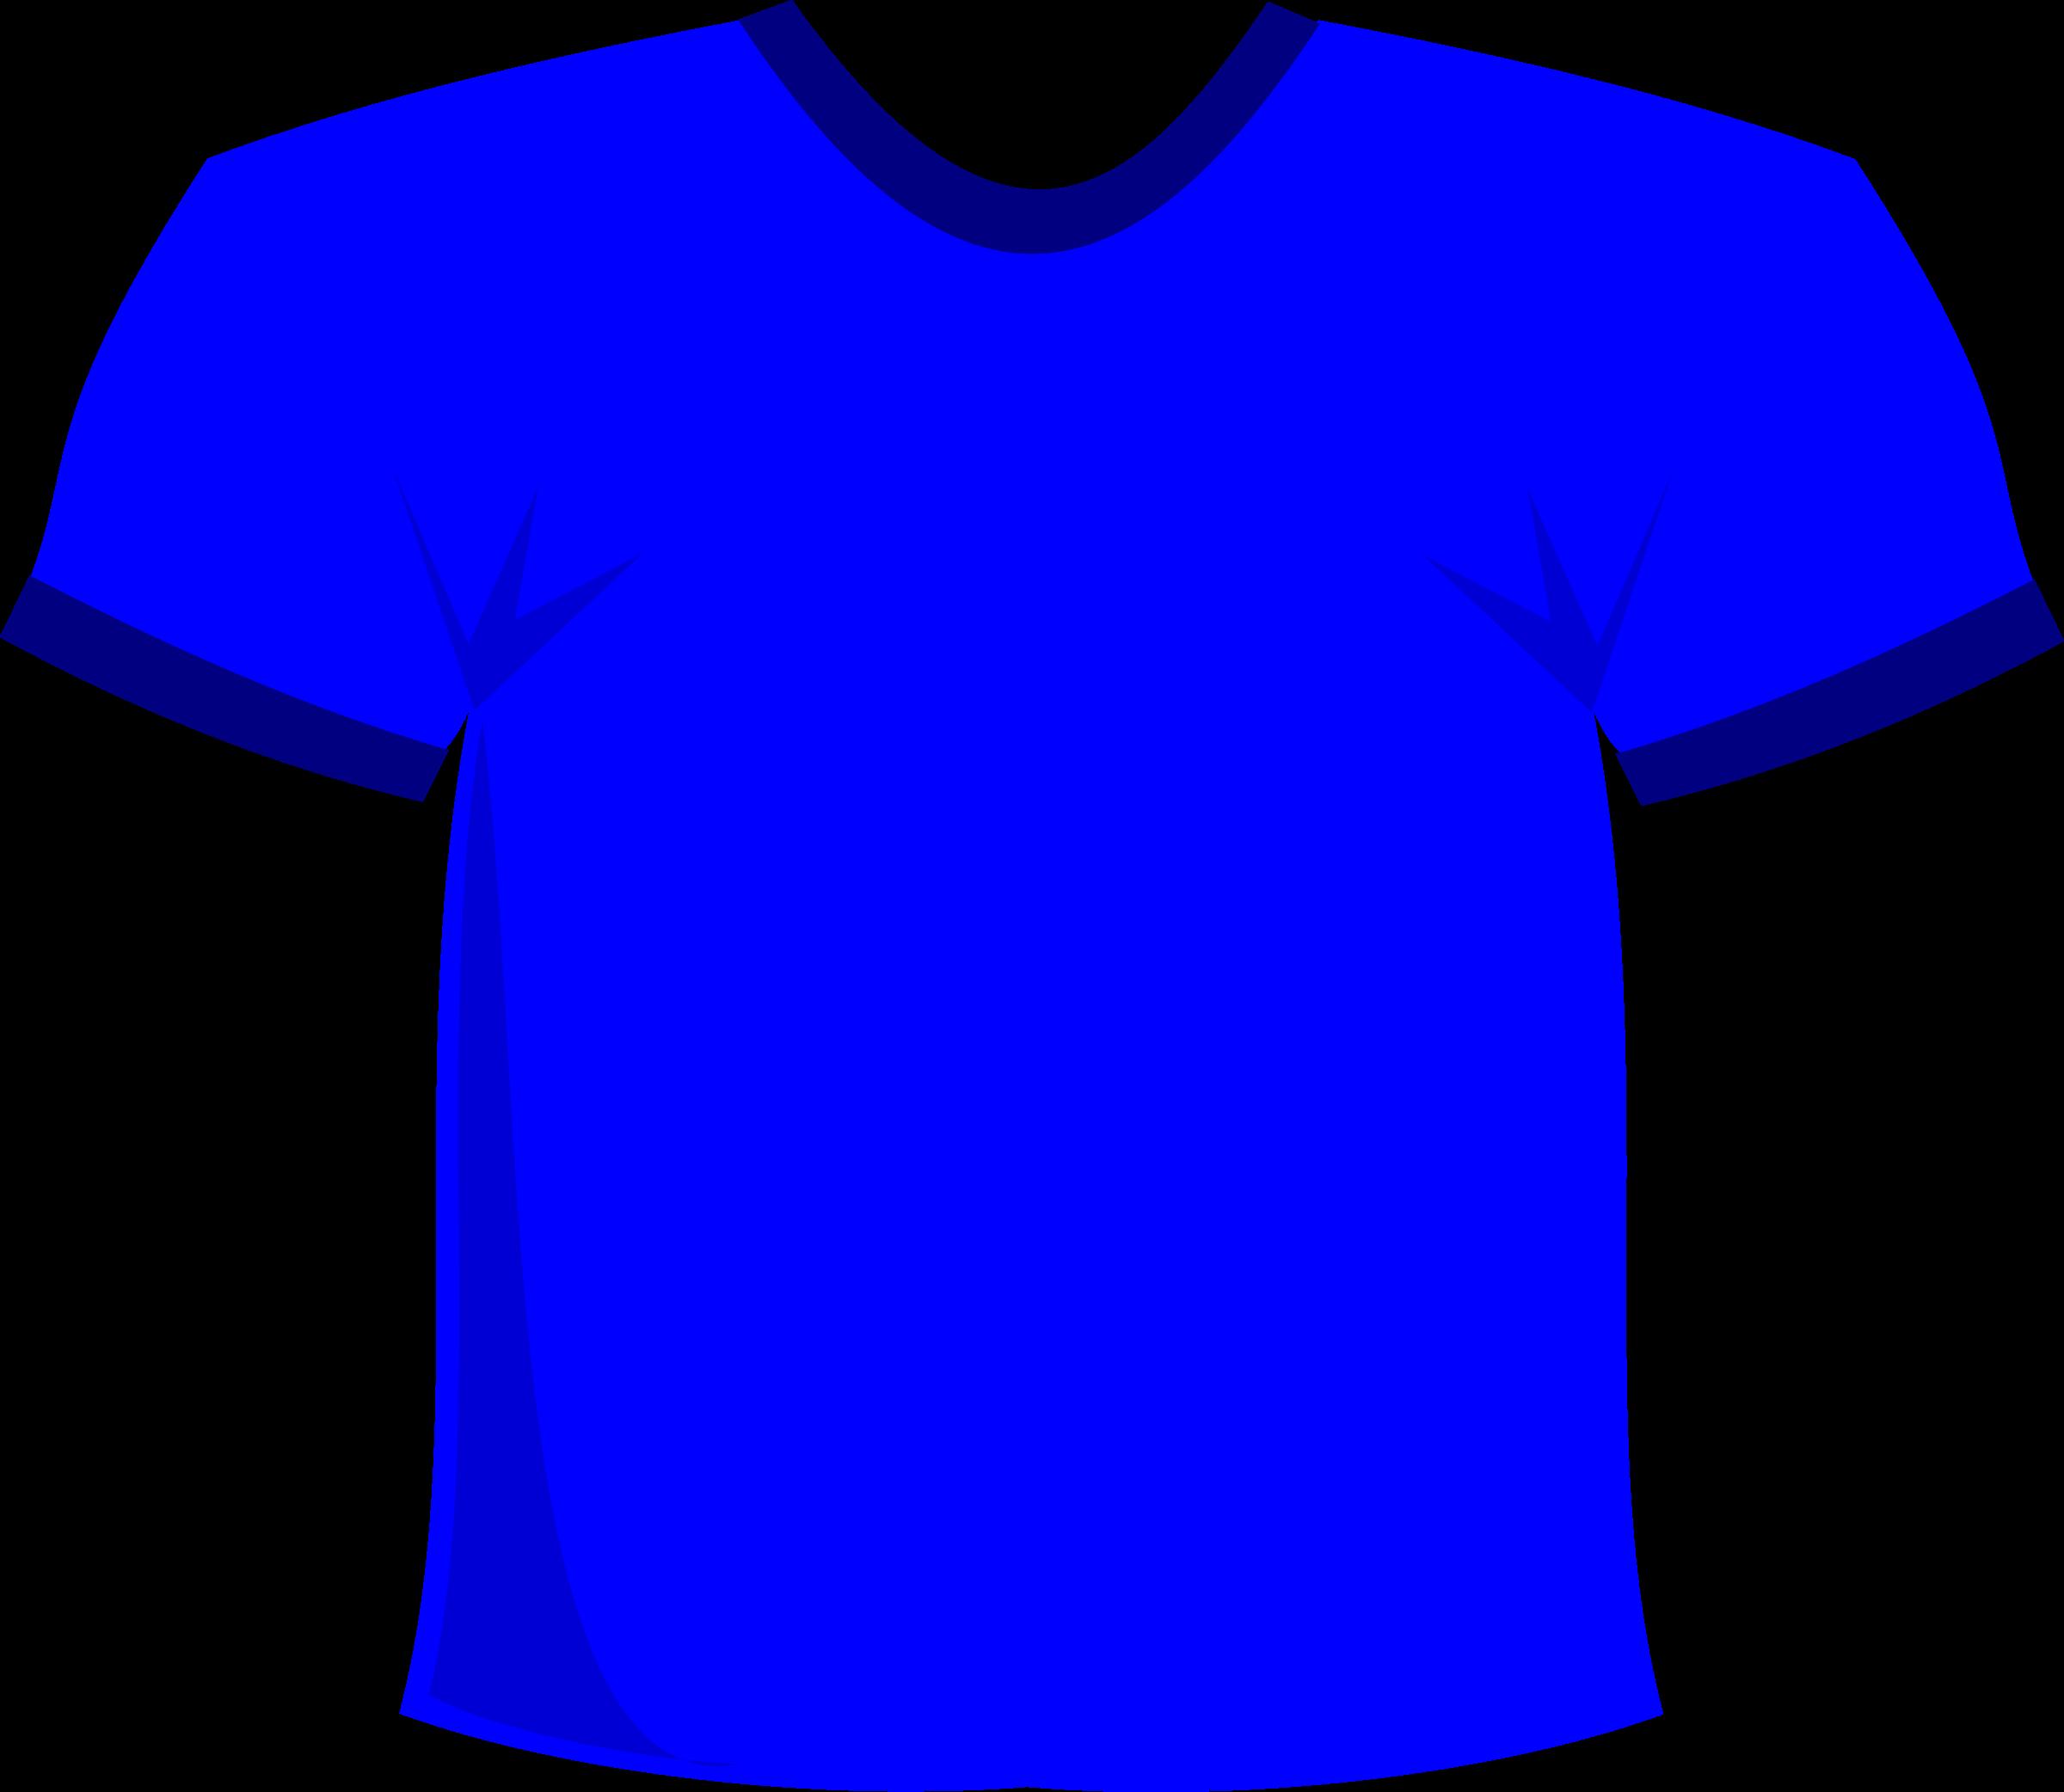 BIG IMAGE (PNG) - Blue Tshirt PNG